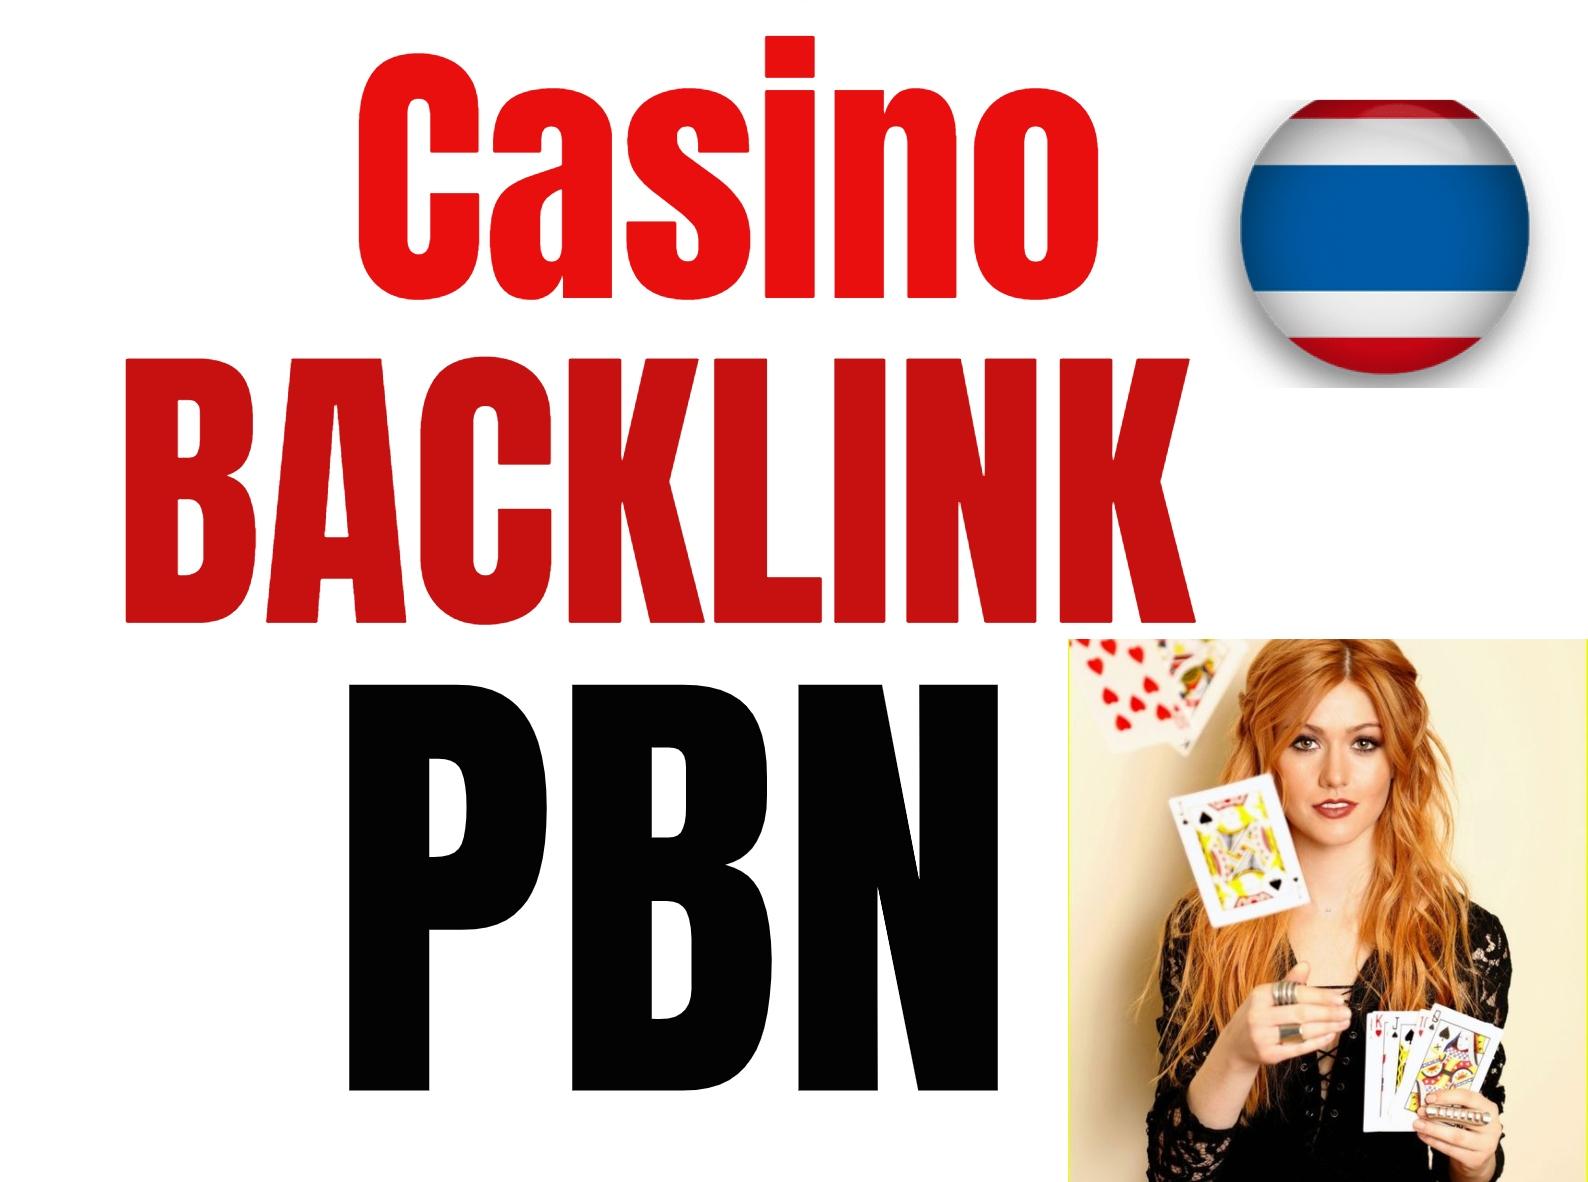 Buy 3 Get 1 free 55 DA 58 To 30 Casino,  Gambling,  Poker,  Judi Related Websites